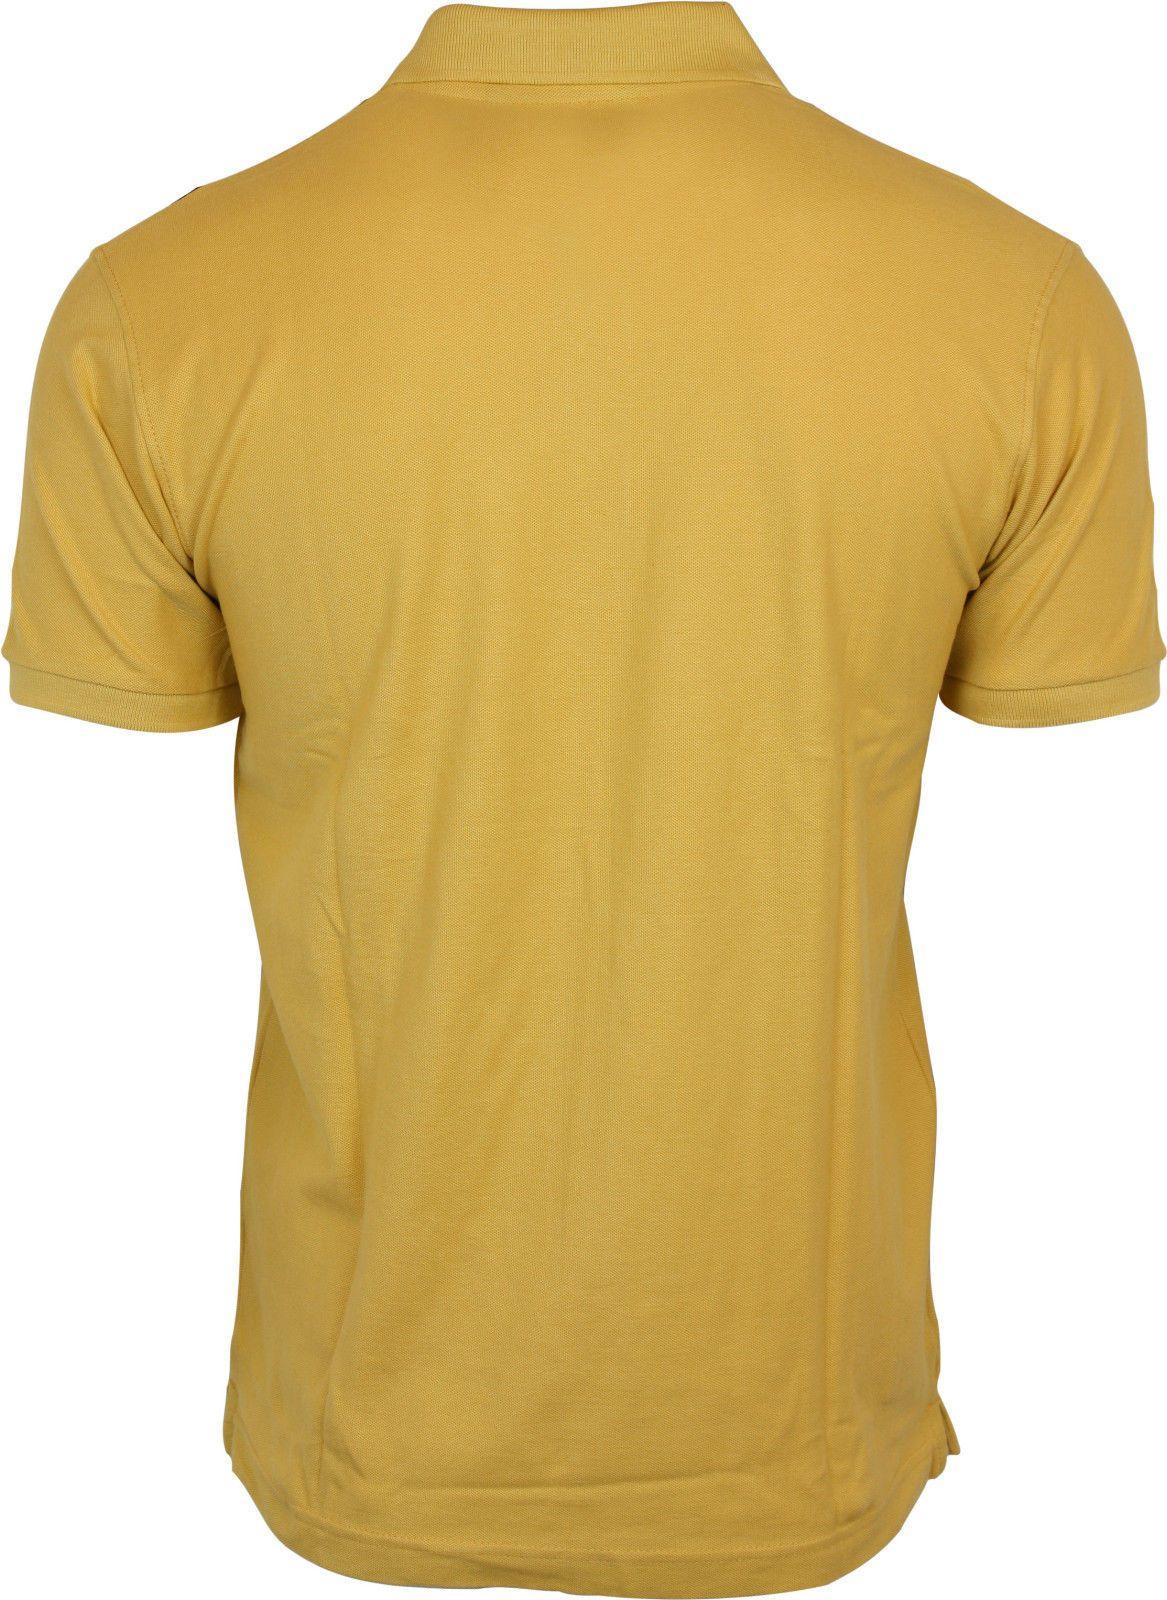 Relco Mens Stripe Pique Polo Shirt Mustard Navy Burgundy